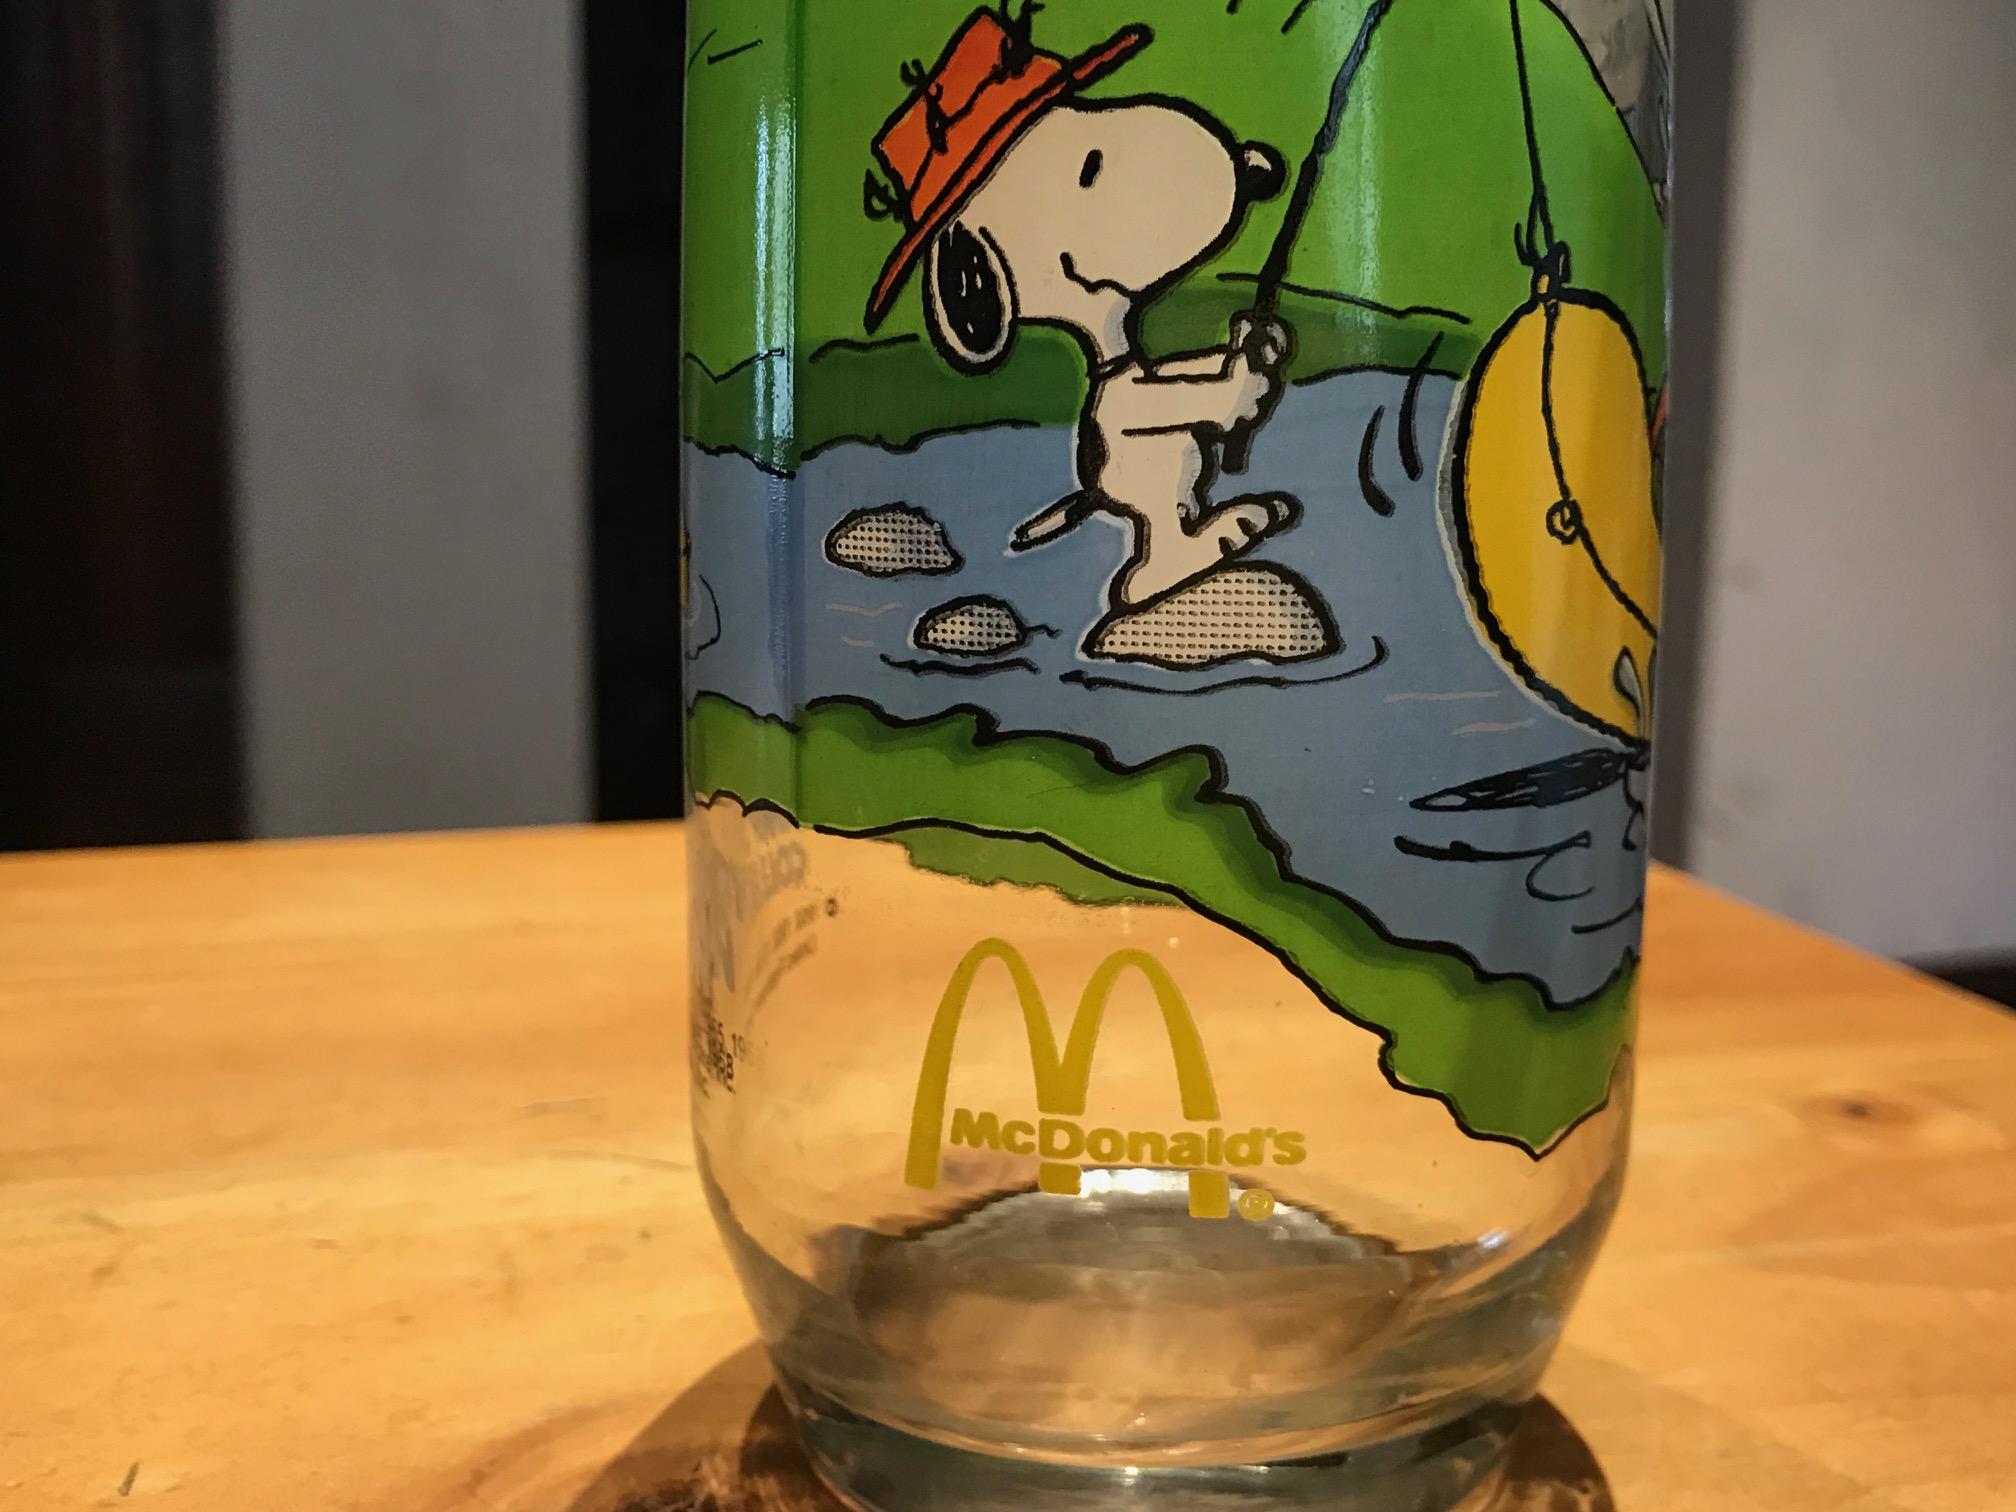 McDonald's (c. 1980s?) Camp Snoopy Collection Glass: 85,100 ppm Lead + 1,827 ppm Cadmium + 99 ppm MERCURY!